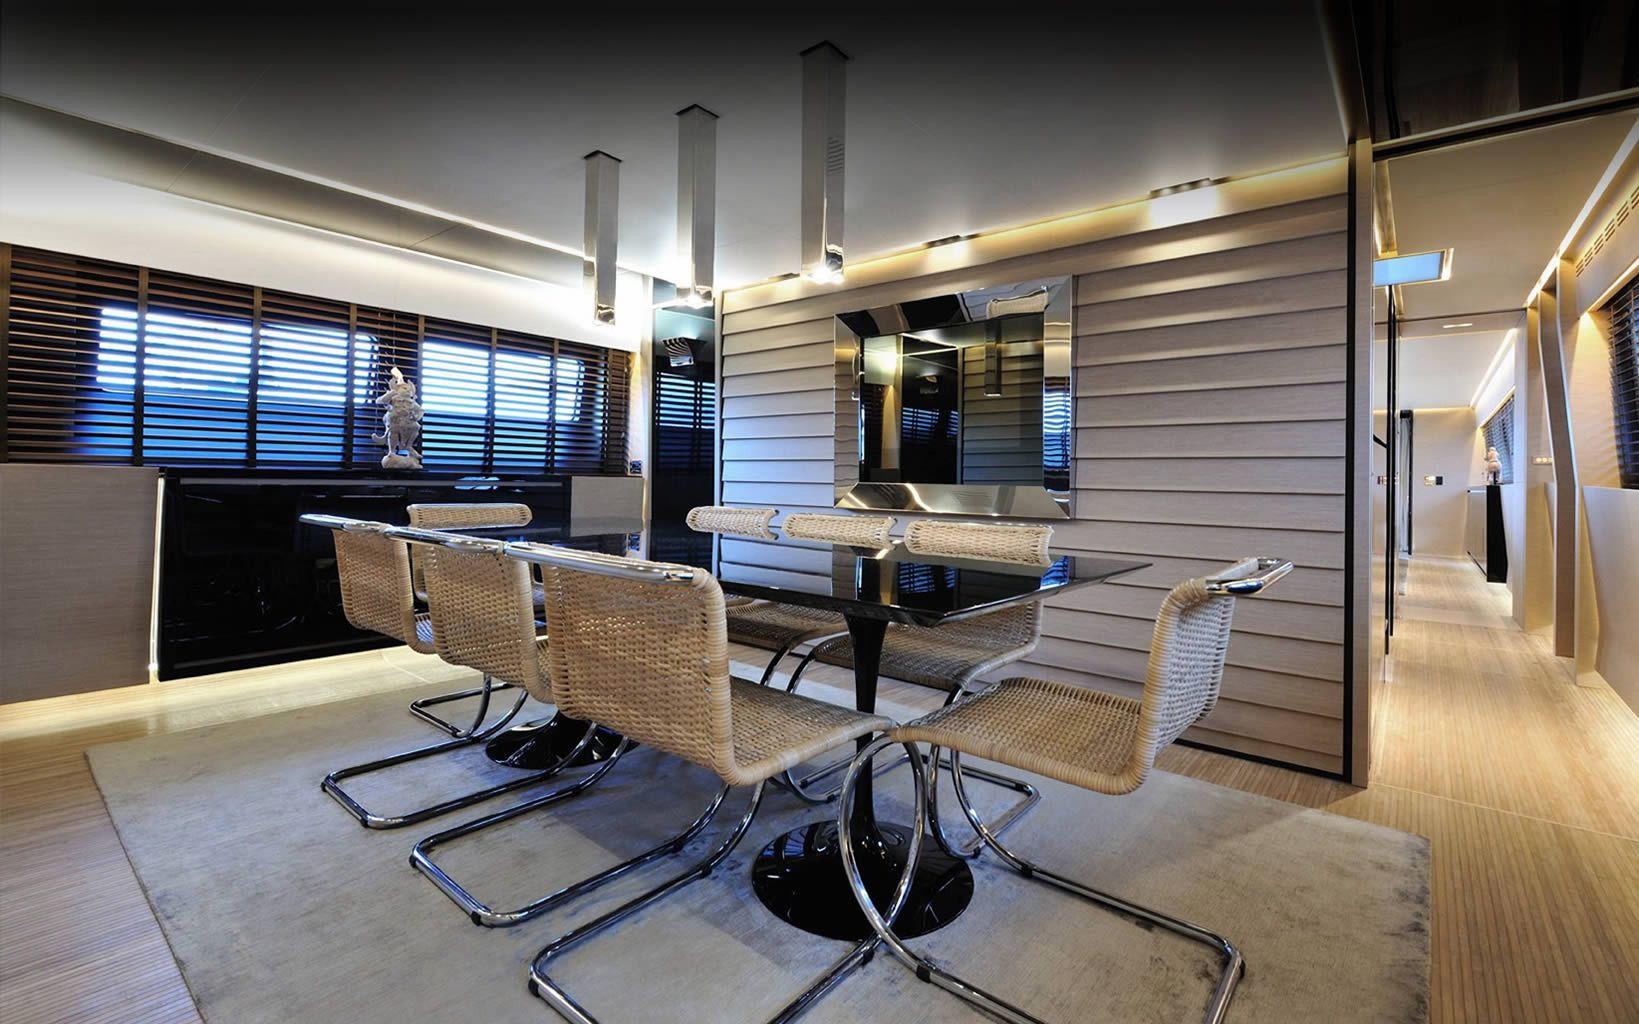 Innenarchitektur Yacht bertona boat interior design yacht schiffe